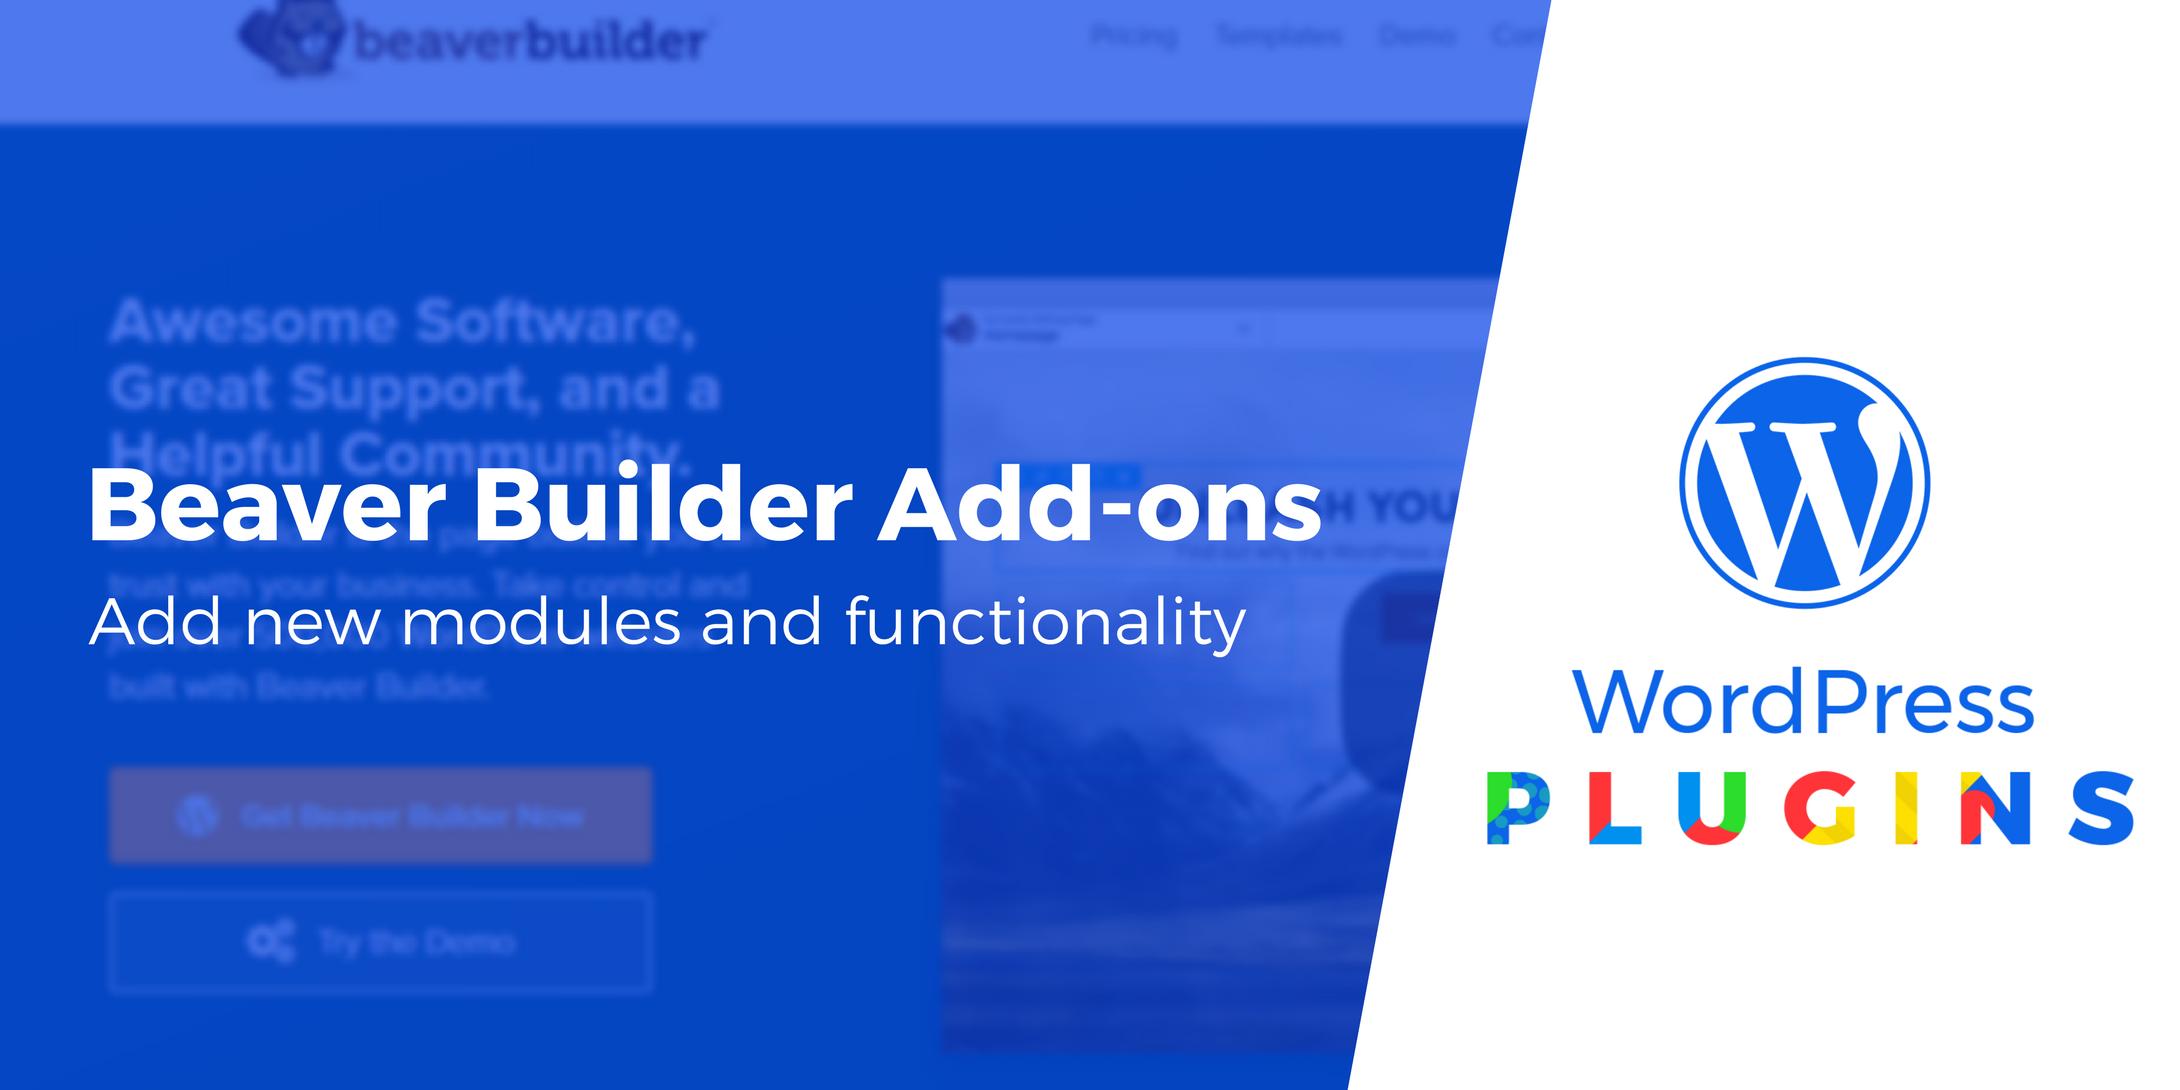 Beaver Builder Add-ons